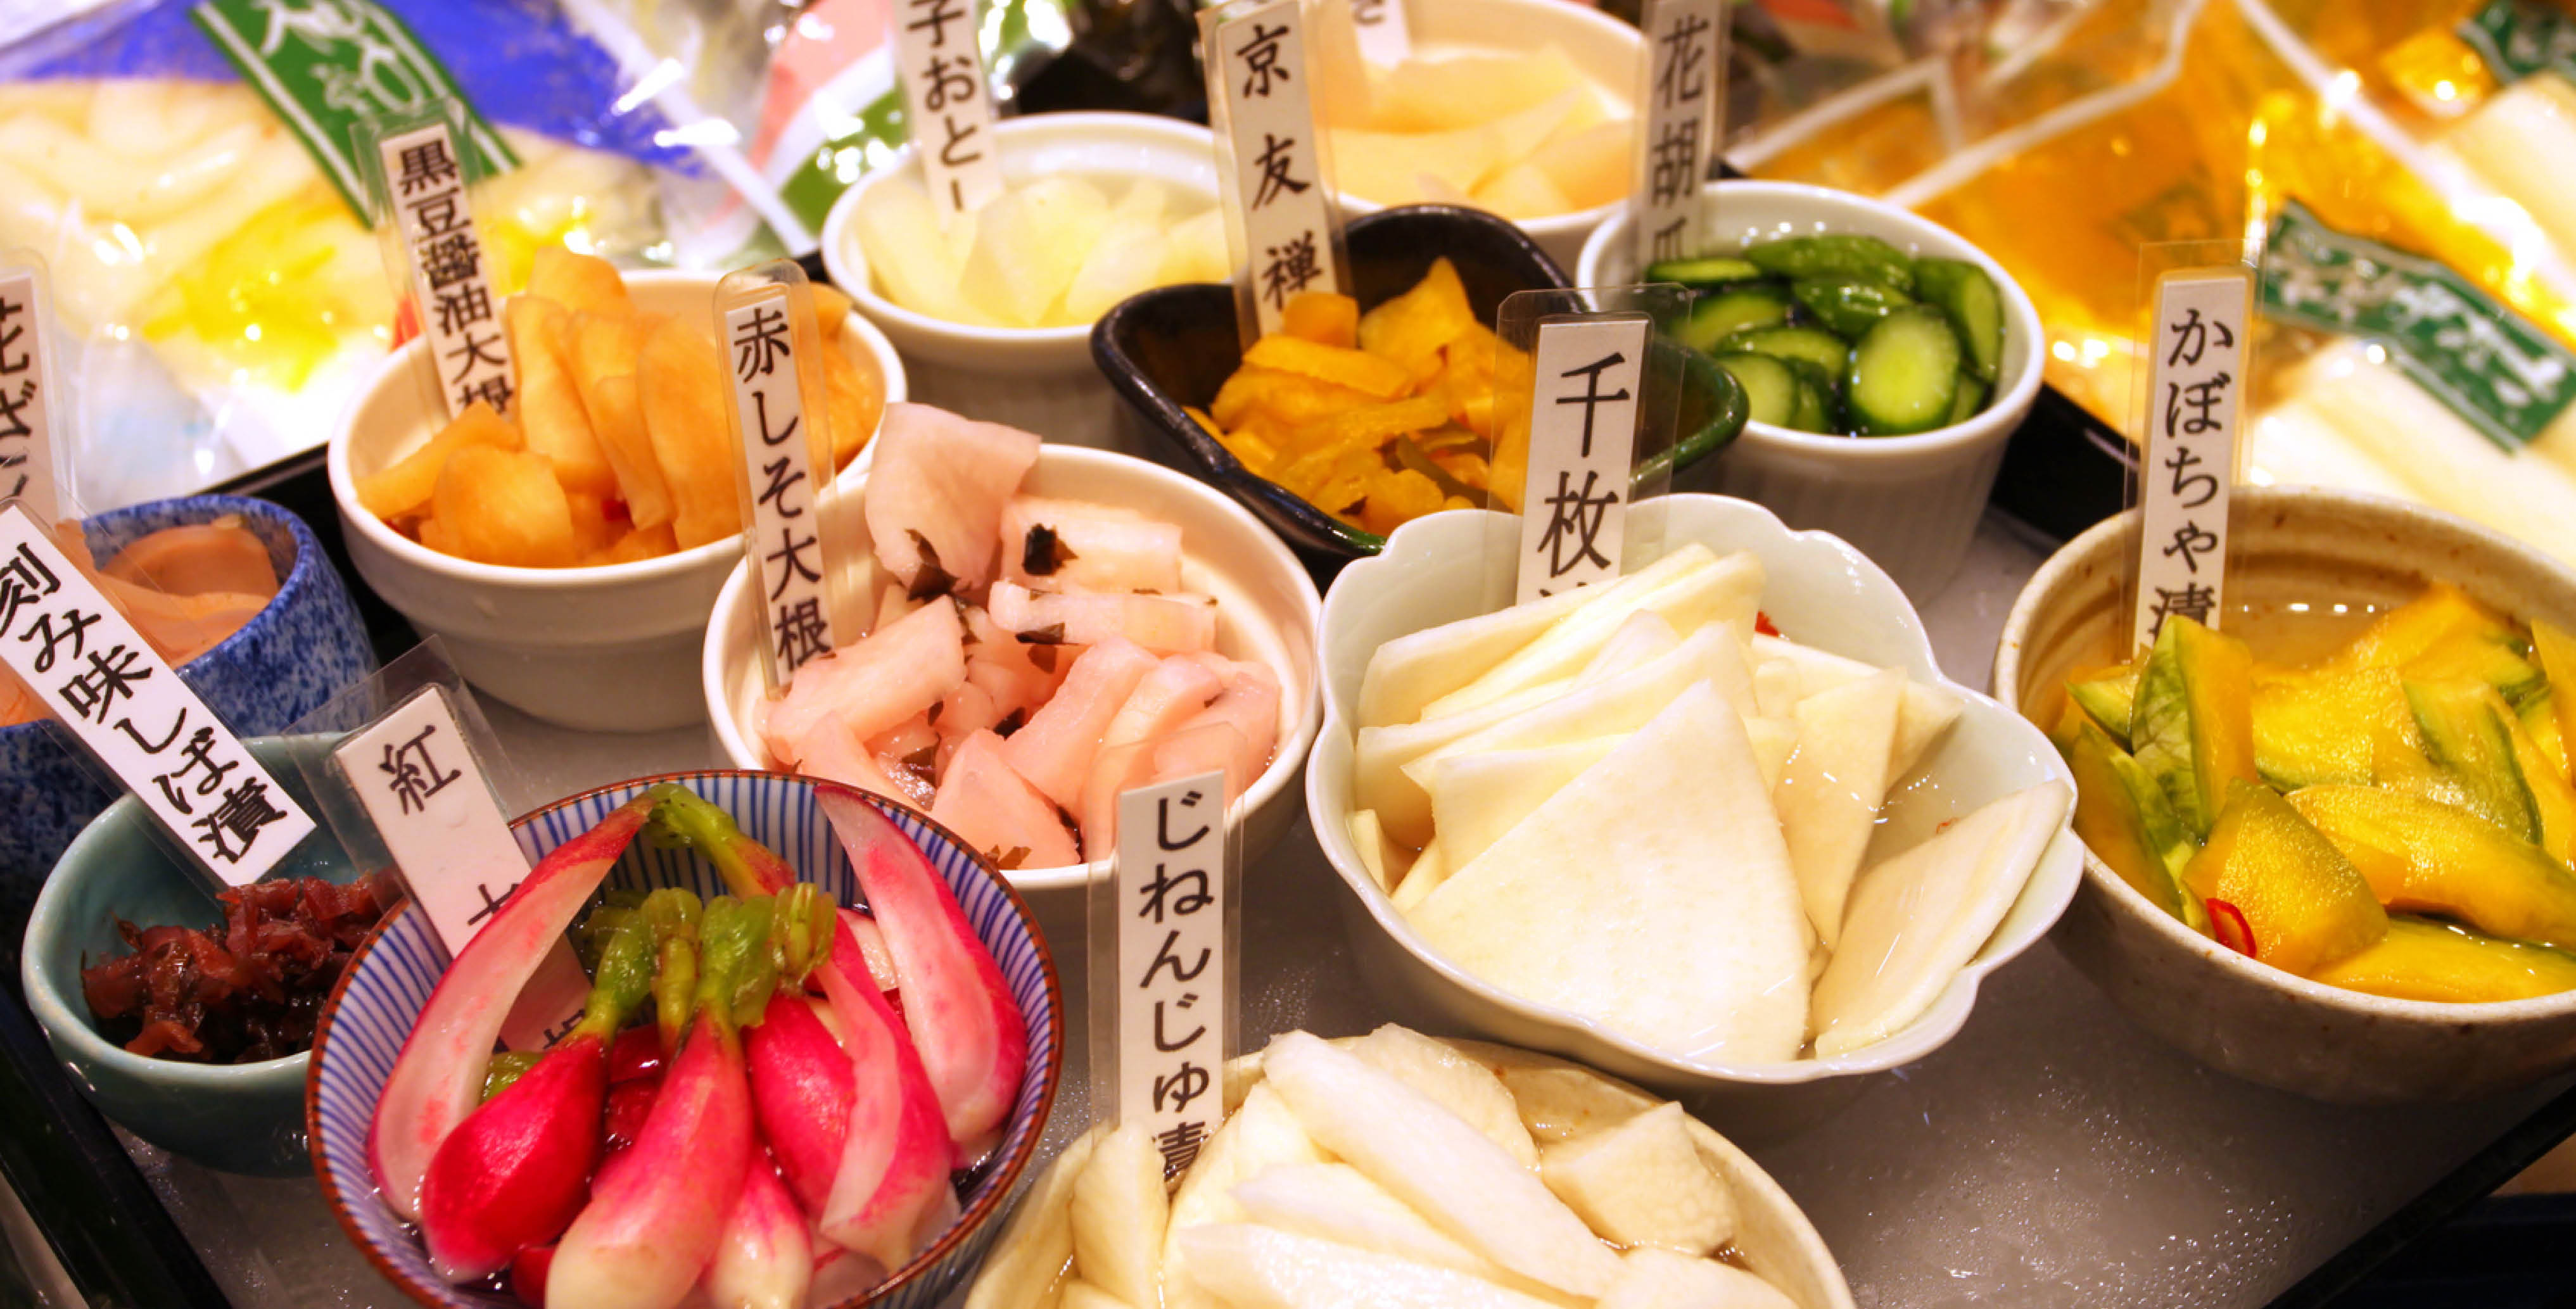 5e97  4e3b  656c  767d japanese food culture, may one day of hagakure ramen and izakaya and yakitori of tokyo